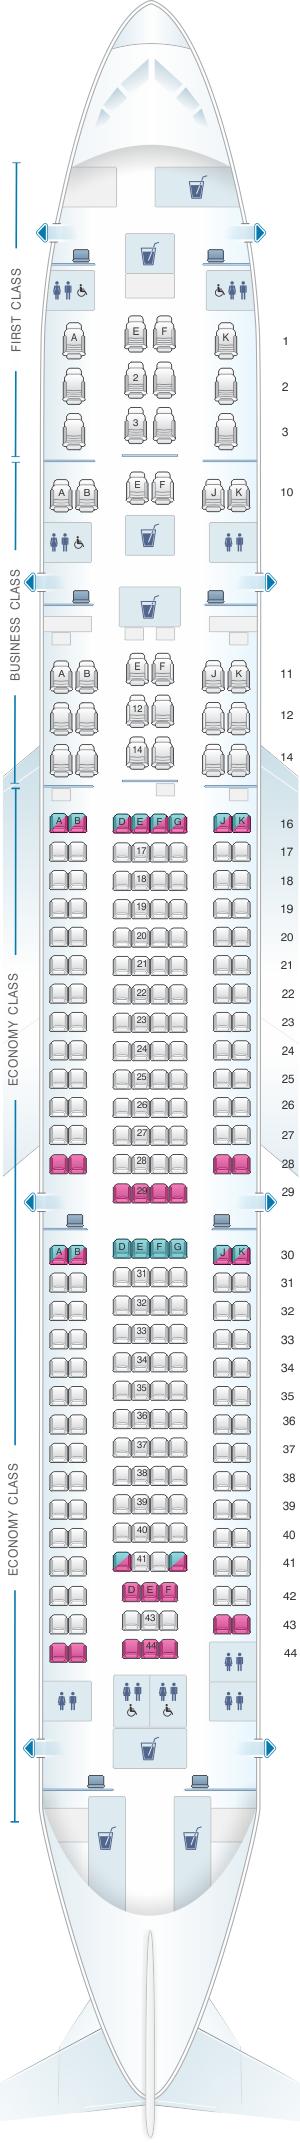 Seat map for Qatar Airways Airbus A330 300 259pax